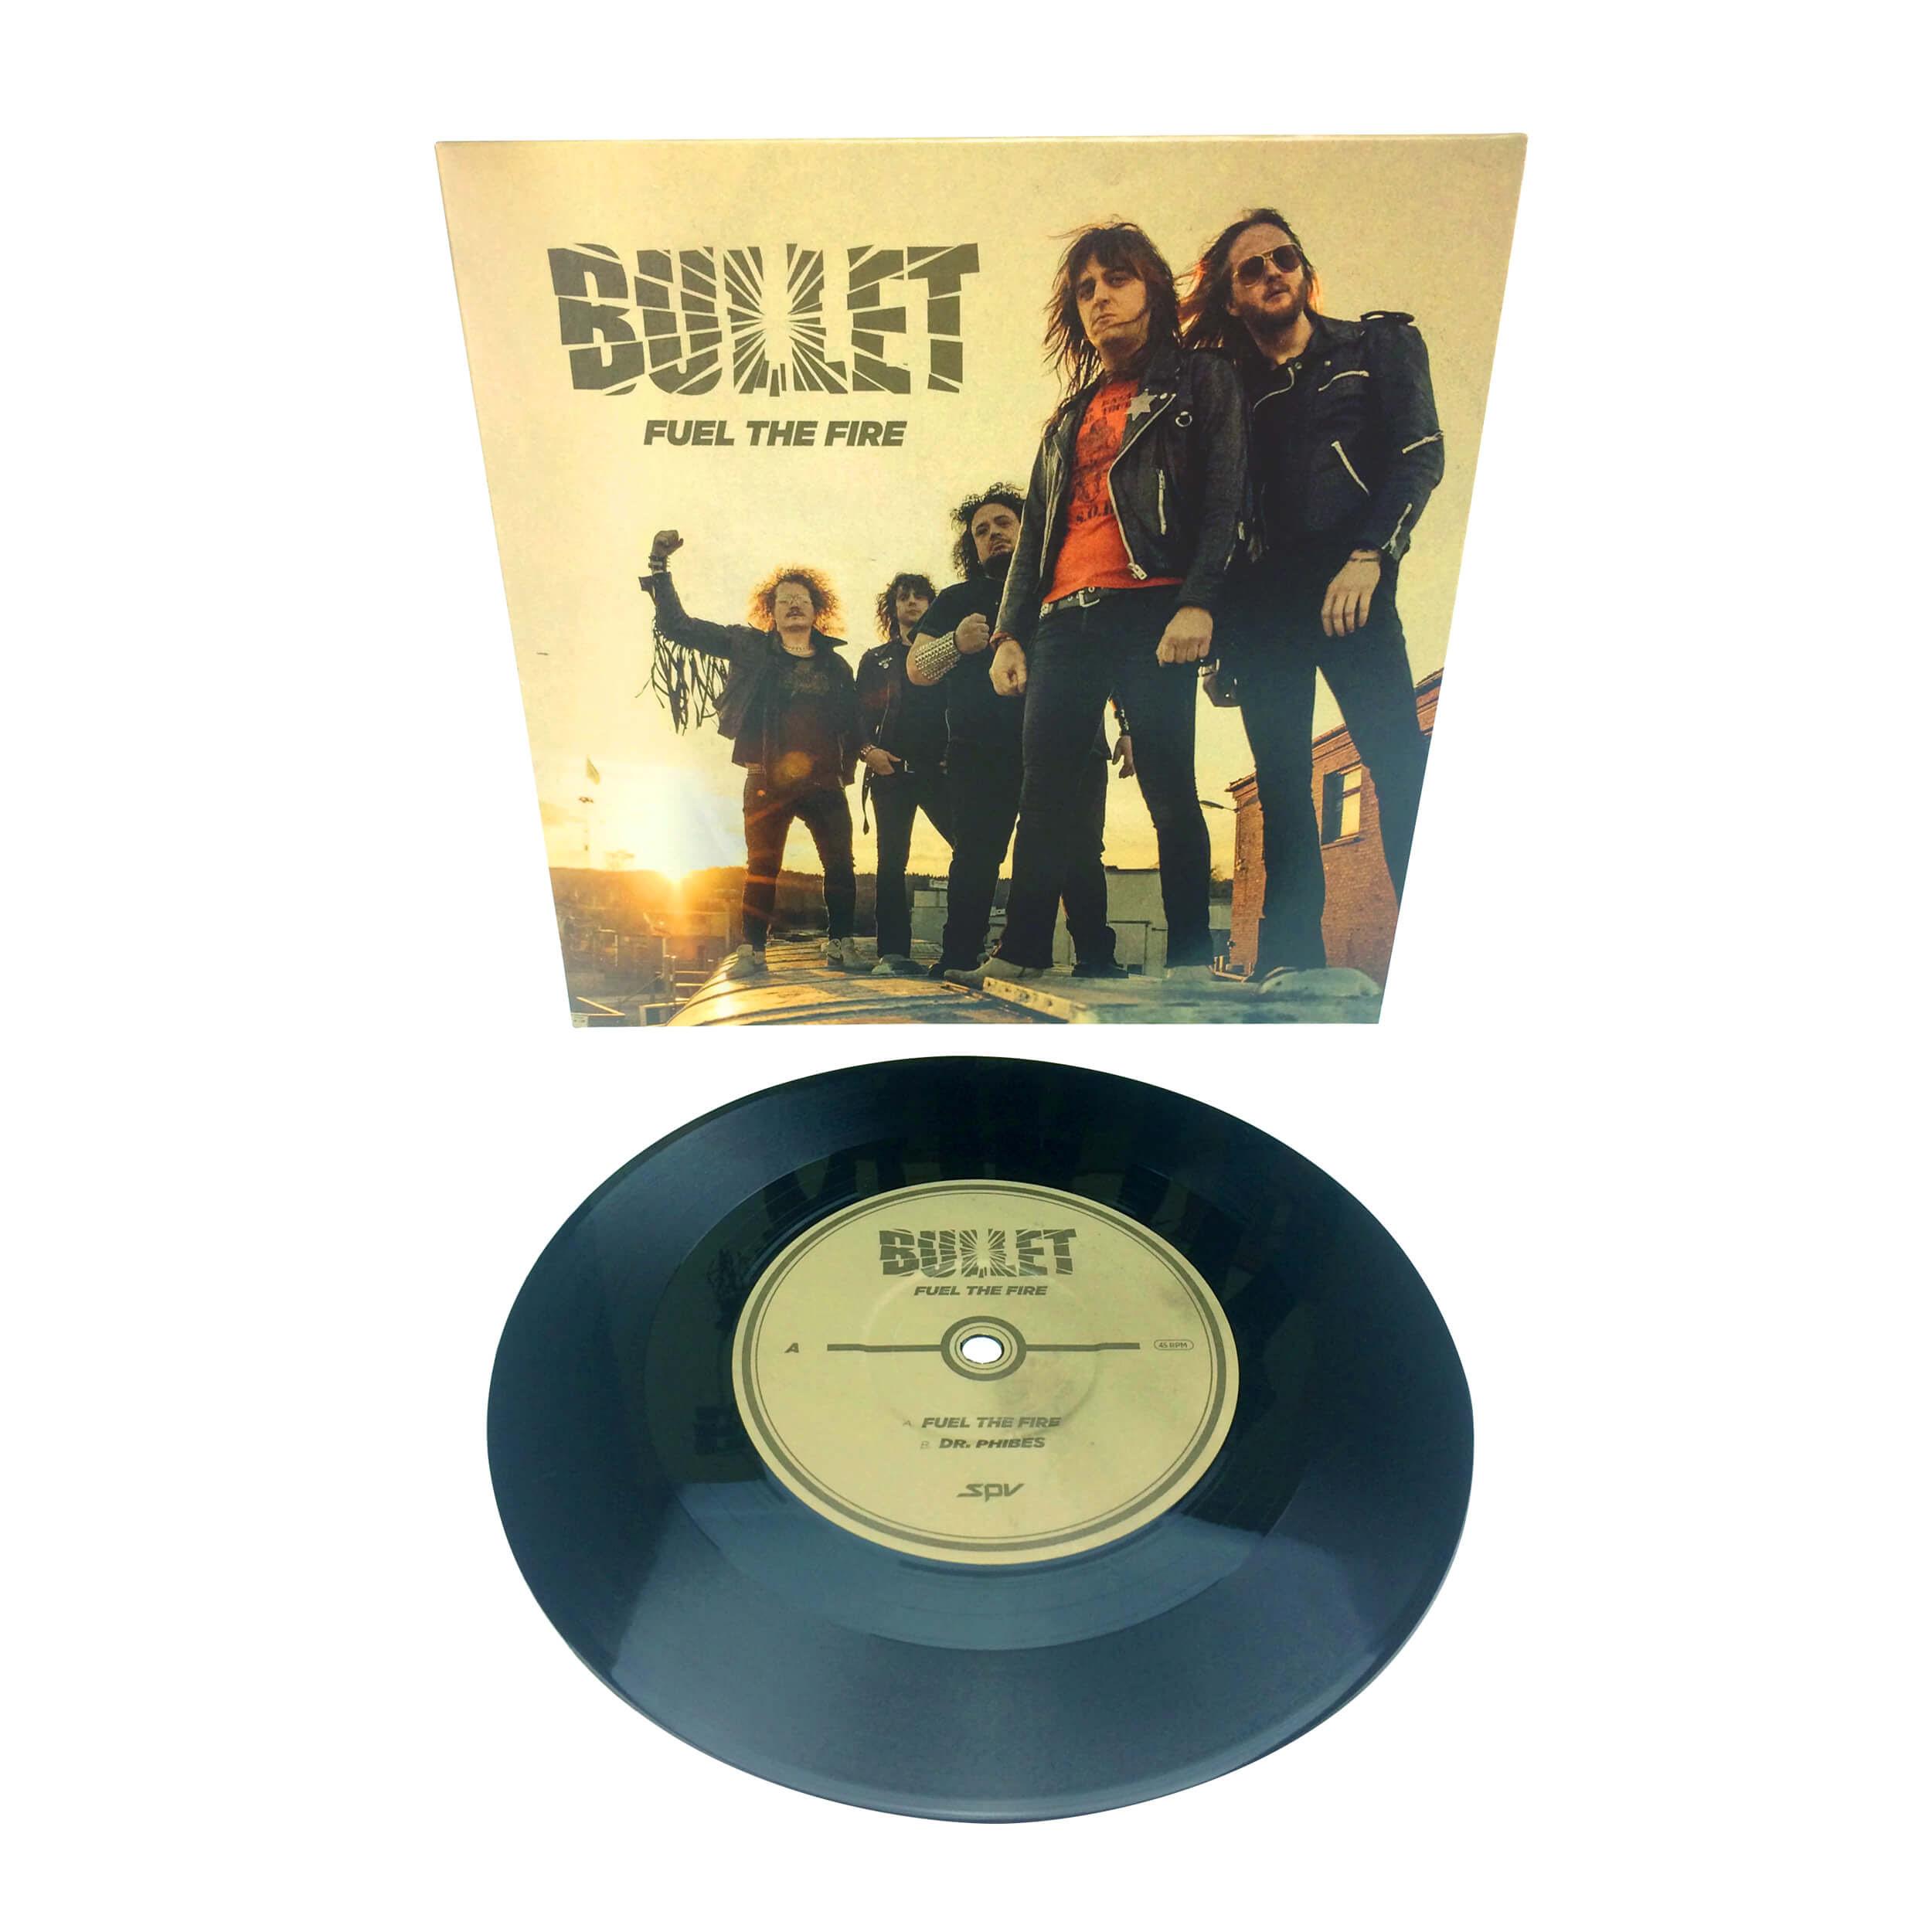 "Swedish Metal band  Bullet have released a new digital single and video today. The new song   ""Fuel The Fire""  is taken from the forthcoming studio album ""Dust To Gold"". The song is also available as a limited 7"" vinyl version with a cover version of  ANGEL WITCH's "" Dr. Phibes"" on Side B.    You can watch the video here:    https://youtu.be/M_KTlSbaVUU    The new album  ""Dust To Gold"" will be released through  Steamhammer/SPV on  April 20th 2018 as  CD digi  (incl. poster) / 2LP gatefold  (golden vinyl) / download / stream : https://Bullet.lnk.to/DustToGold      BULLET live 2018:   21.04. SE- Vaxjo - Strandbjörkshallen  (Release Show, new)   03.05. DE- Berlin - Musik&Frieden  04.05. DE- Leipzig - Hellraiser  05.05. DE- Markneukirchen - Framus&Warwick Music Hall  06.05. DE- Bochum - Matrix  07.05. BE- Genk - Colosseum  09.05. ES- Vitoria - Jimmy Jazz  10.05. PT- Lisbon - RCA Club  11.05. ES- Madrid - Caracol  12.05. ES- Barcelona - Razzmatazz 3  13.05. ES- Valencia - Paberse Club 14.05. FR- Saint Etienne - Thunderbird Lounge (new)   15.05. FR- Paris - Le Klub  16.05. UK- London - Islington o2 Academy 2  17.05. DE- Siegburg - Kubana  18.05. CH- Pratteln - Z7  19.05. DE- Mannheim - MS Connexion Complex  20.05. AT- Vienna - Escape  21.05. HU- Budapest - Dürer Kert  22.05. CZ- Ostrava - Barrack Music Club  23.05. DE- Munich - Backstage  24.05. DE- Nürnberg - Der Cult  25.05. DE- Kassel - K19  26.05. DE- Osnabrück - Bastard Club  27.05. DE- Hamburg - Logo  01.06. SE- Bladinge - Muskelrock  06.06. SE- Sölvesborg - Sweden Rock Festival  15.06. SE- Norköping - Metallsvenskan  08.12. DE- Balingen - Volksbankmesse  (BYH Christmas Party)    For More Info Visit:     http://www.bulletrock.com/      https://www.facebook.com/bulletband/      https://www.facebook.com/steamhammerofficial/"